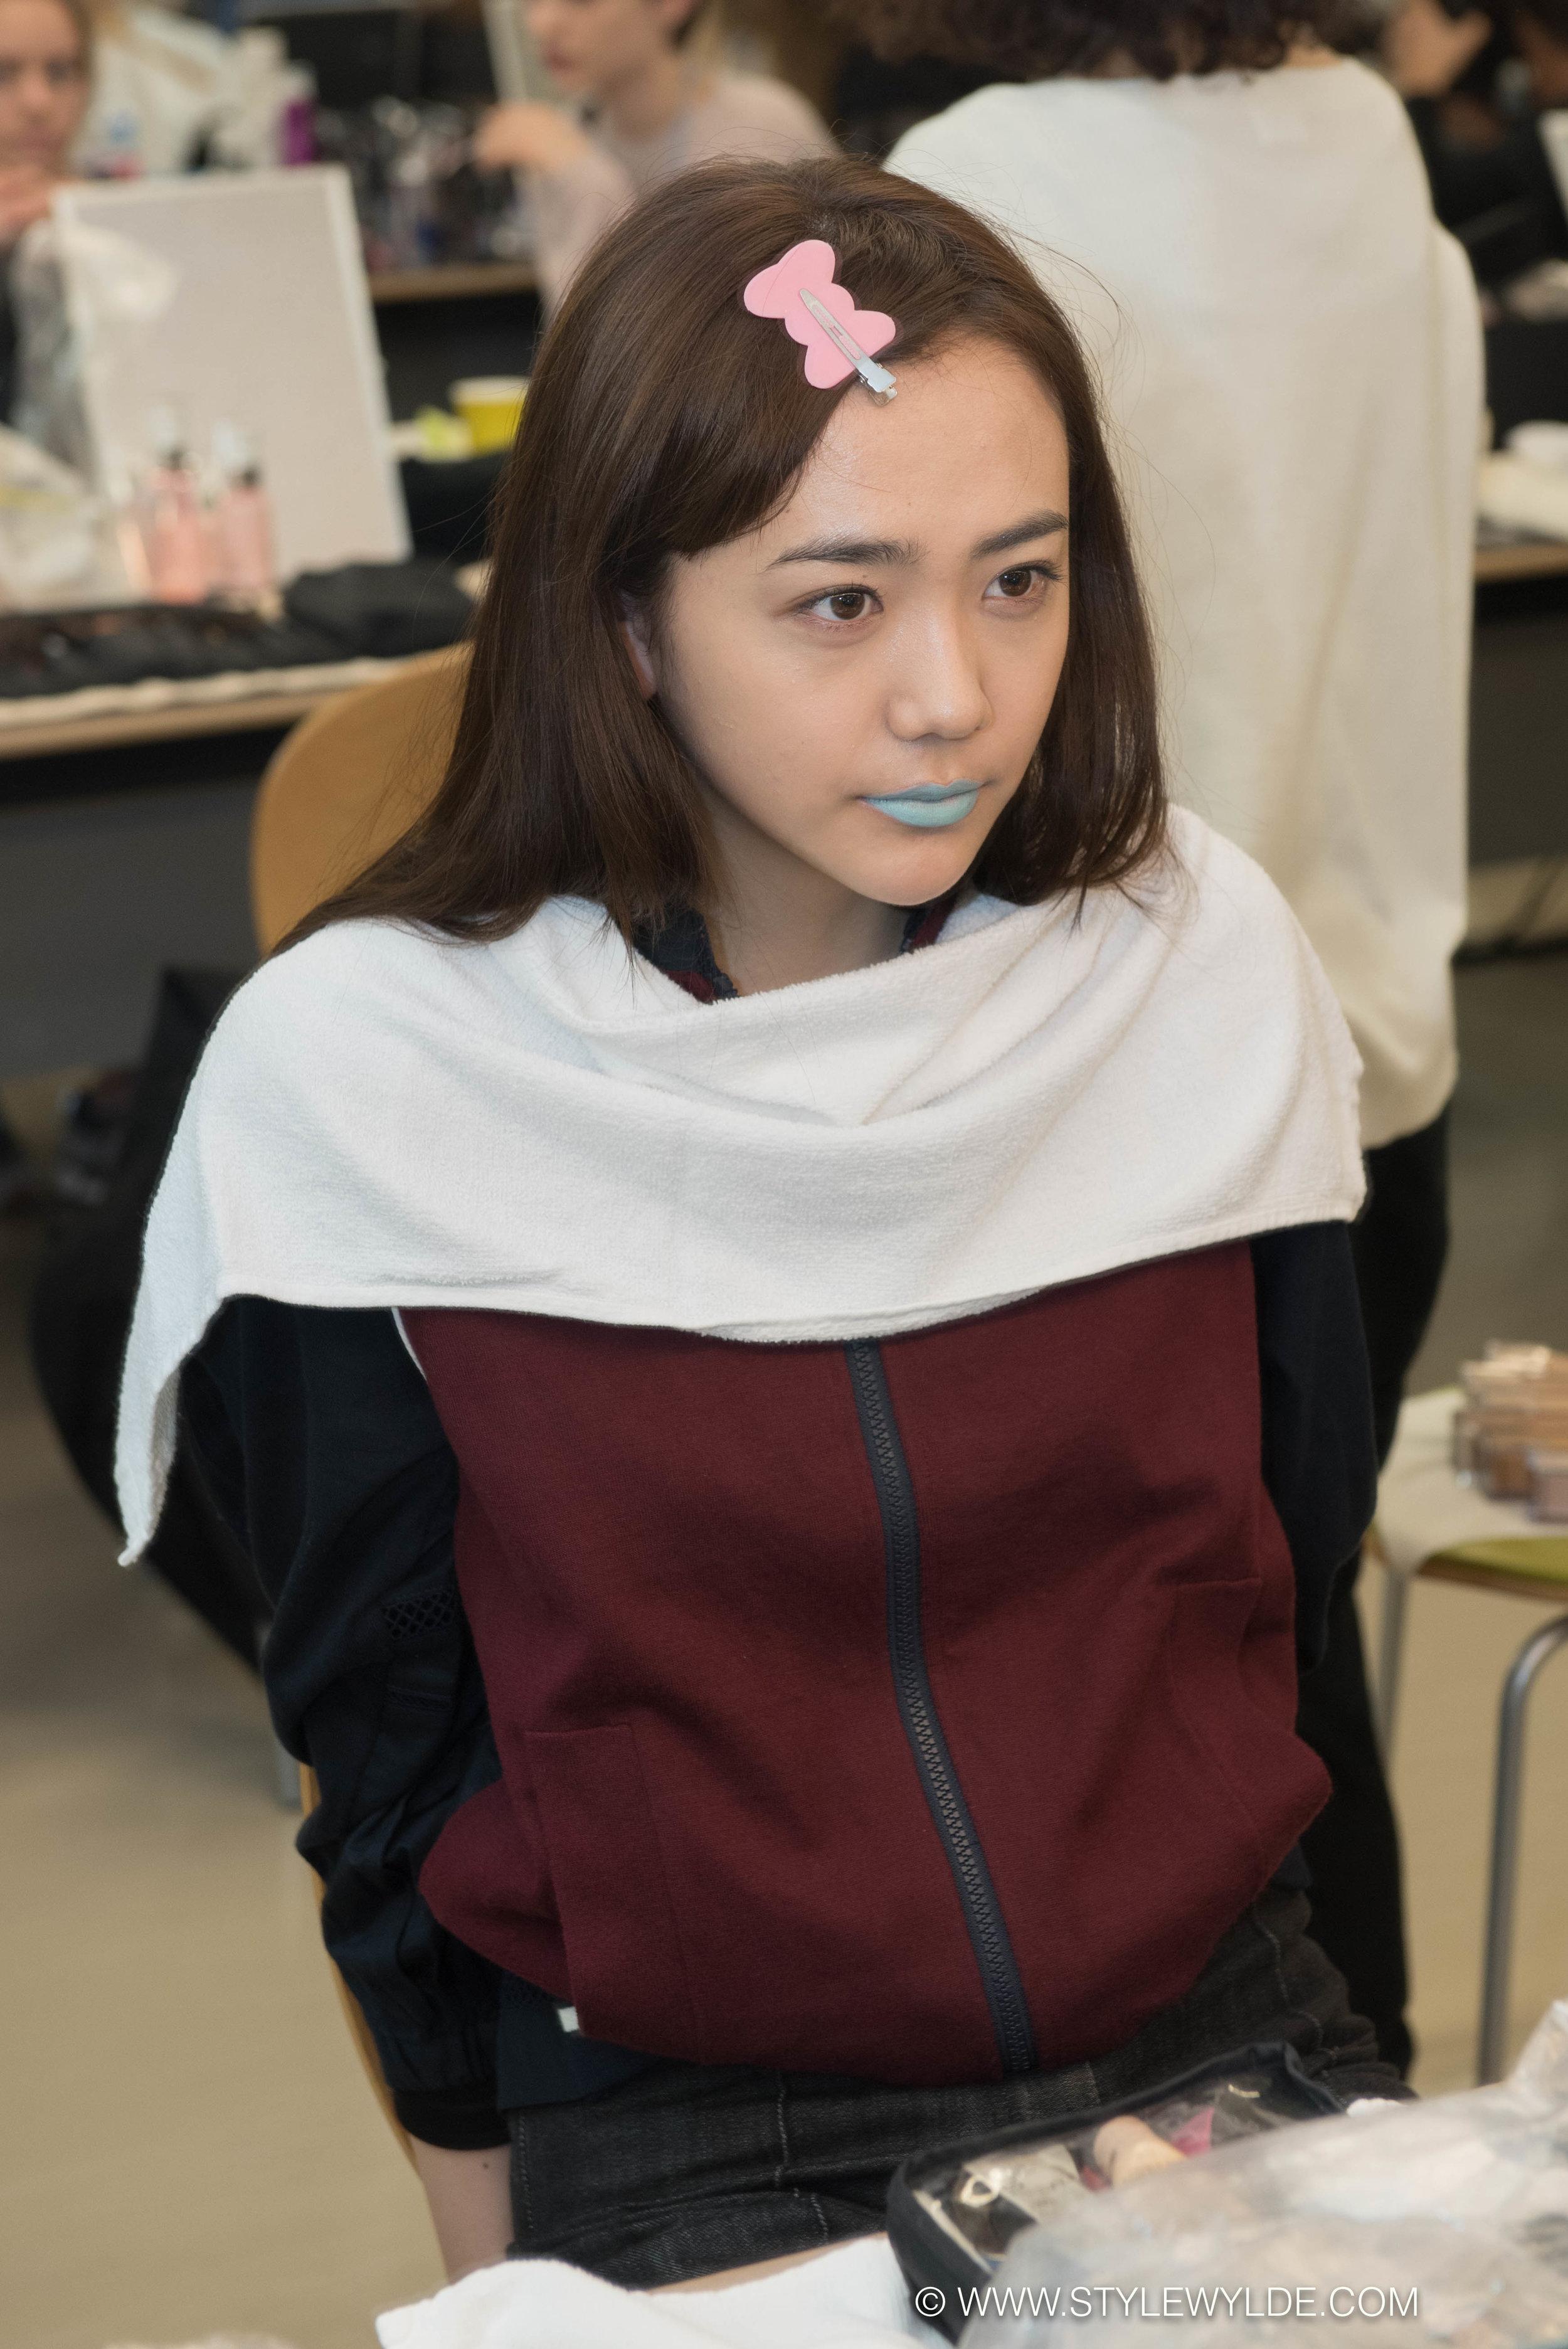 stylewylde-Tiit Tokyo-AW17-BKSTG-1-2.jpg